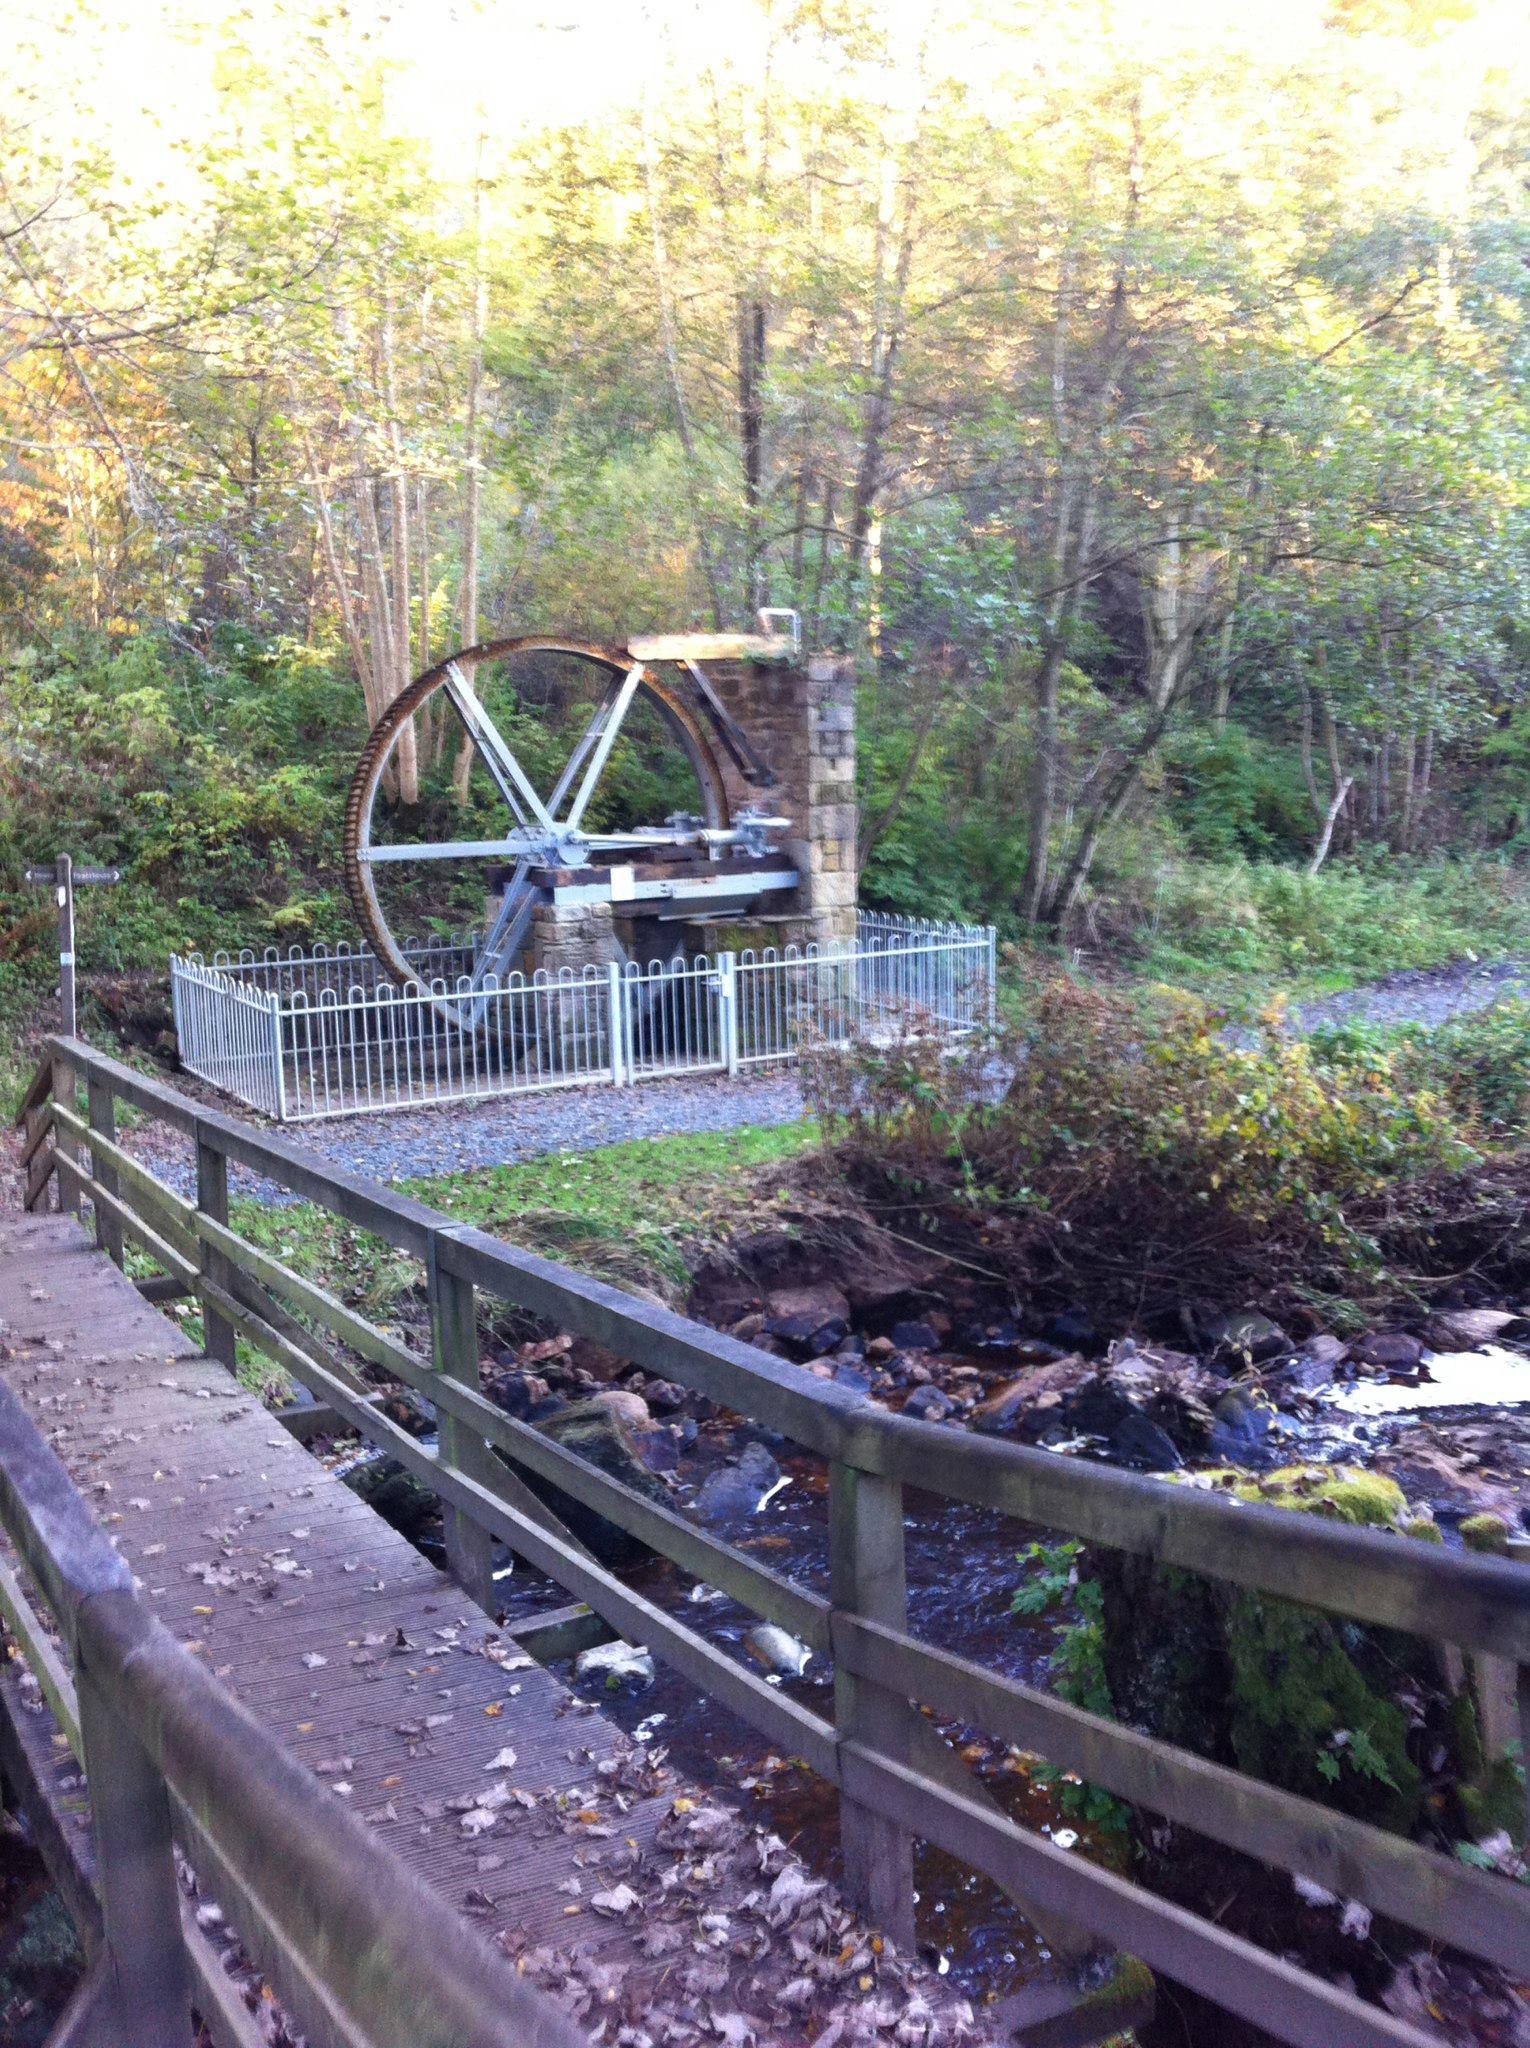 Cragside northumberland water wheel